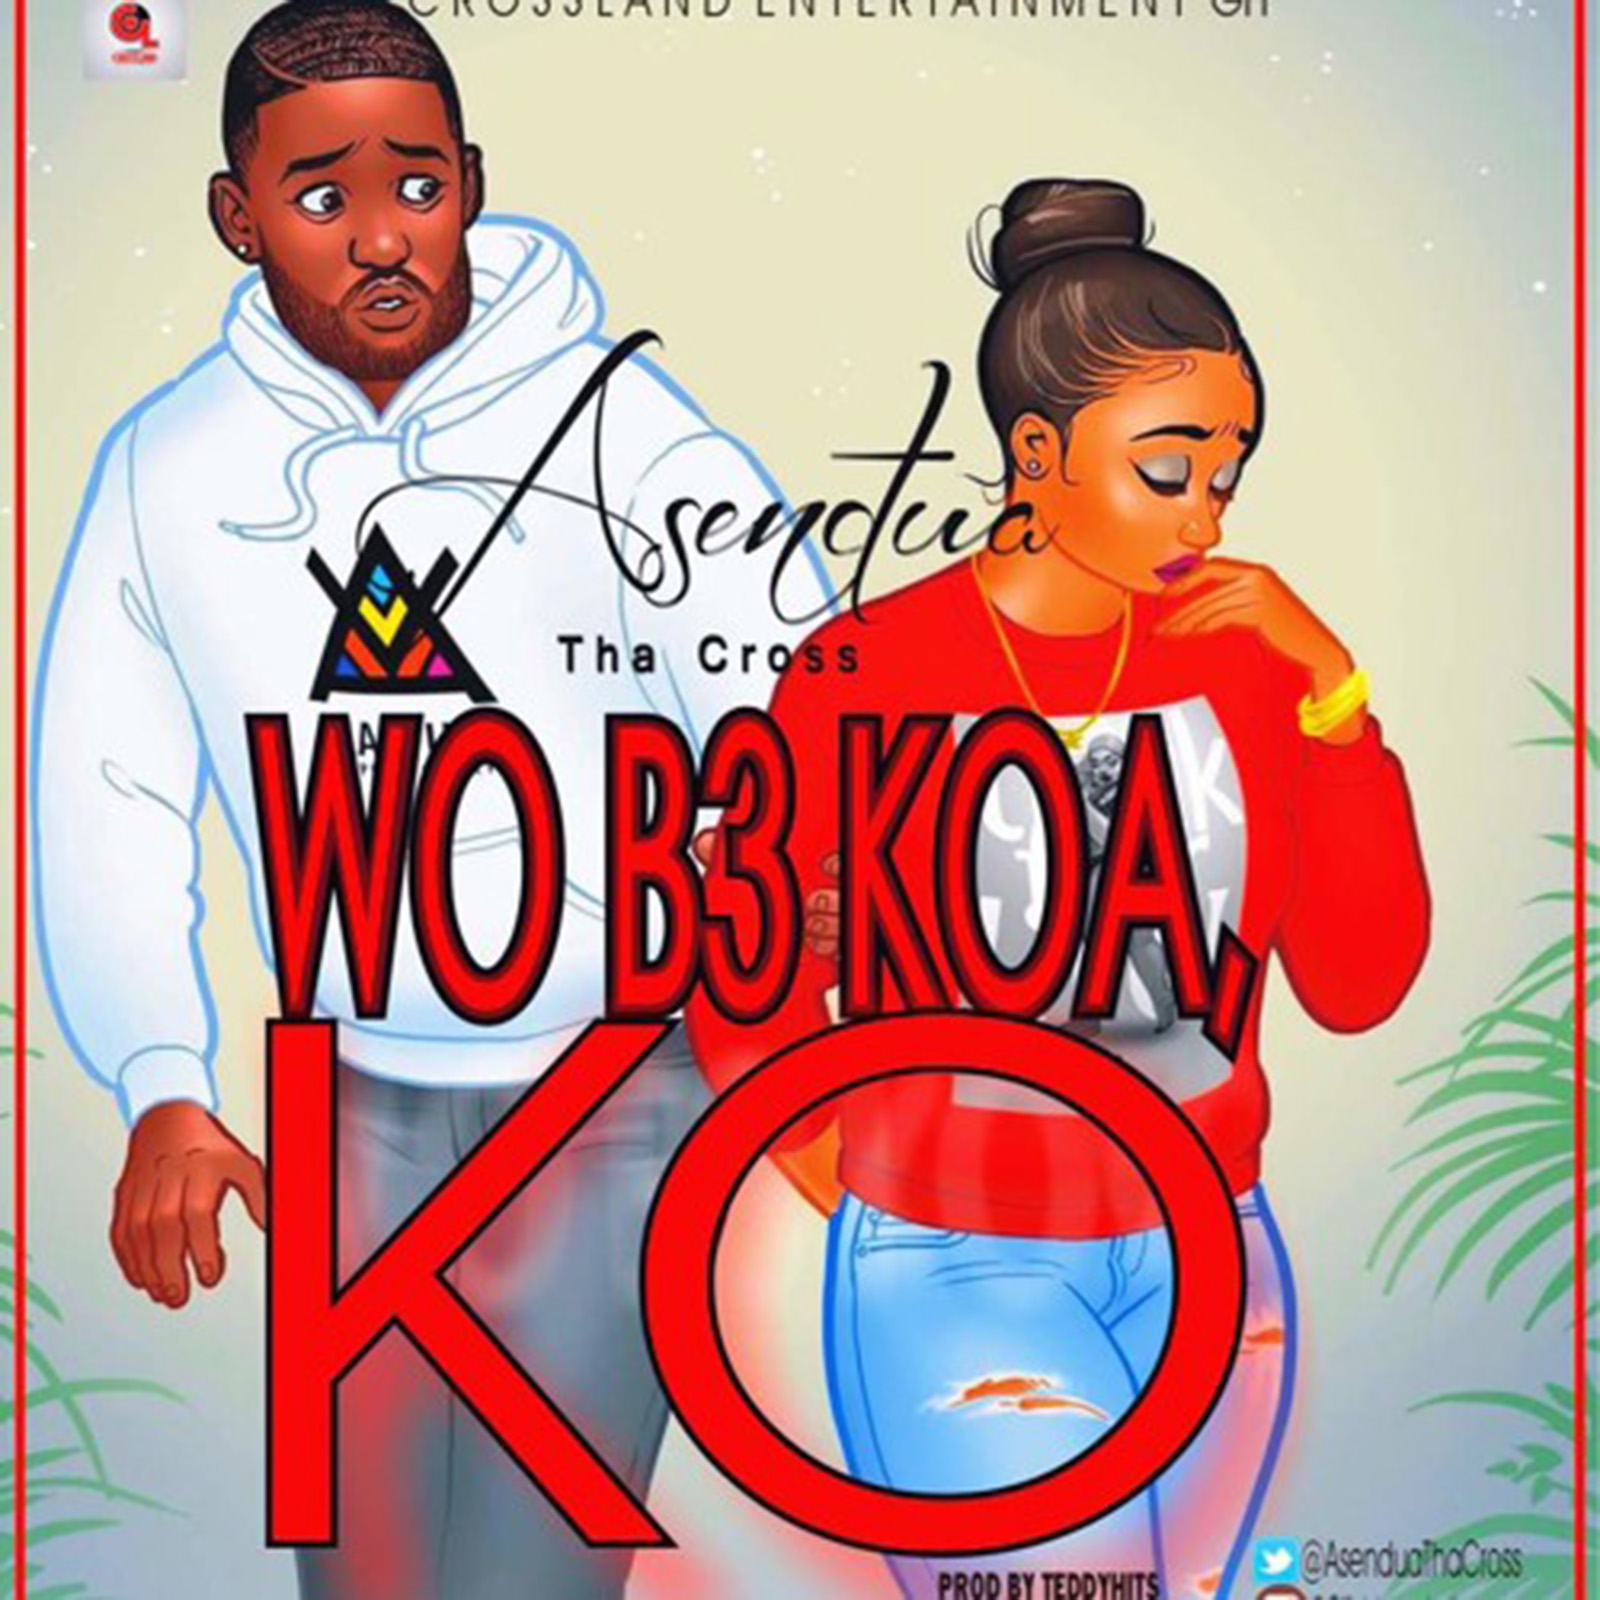 Wo B3 Koa Ko by Asendua Tha Cross